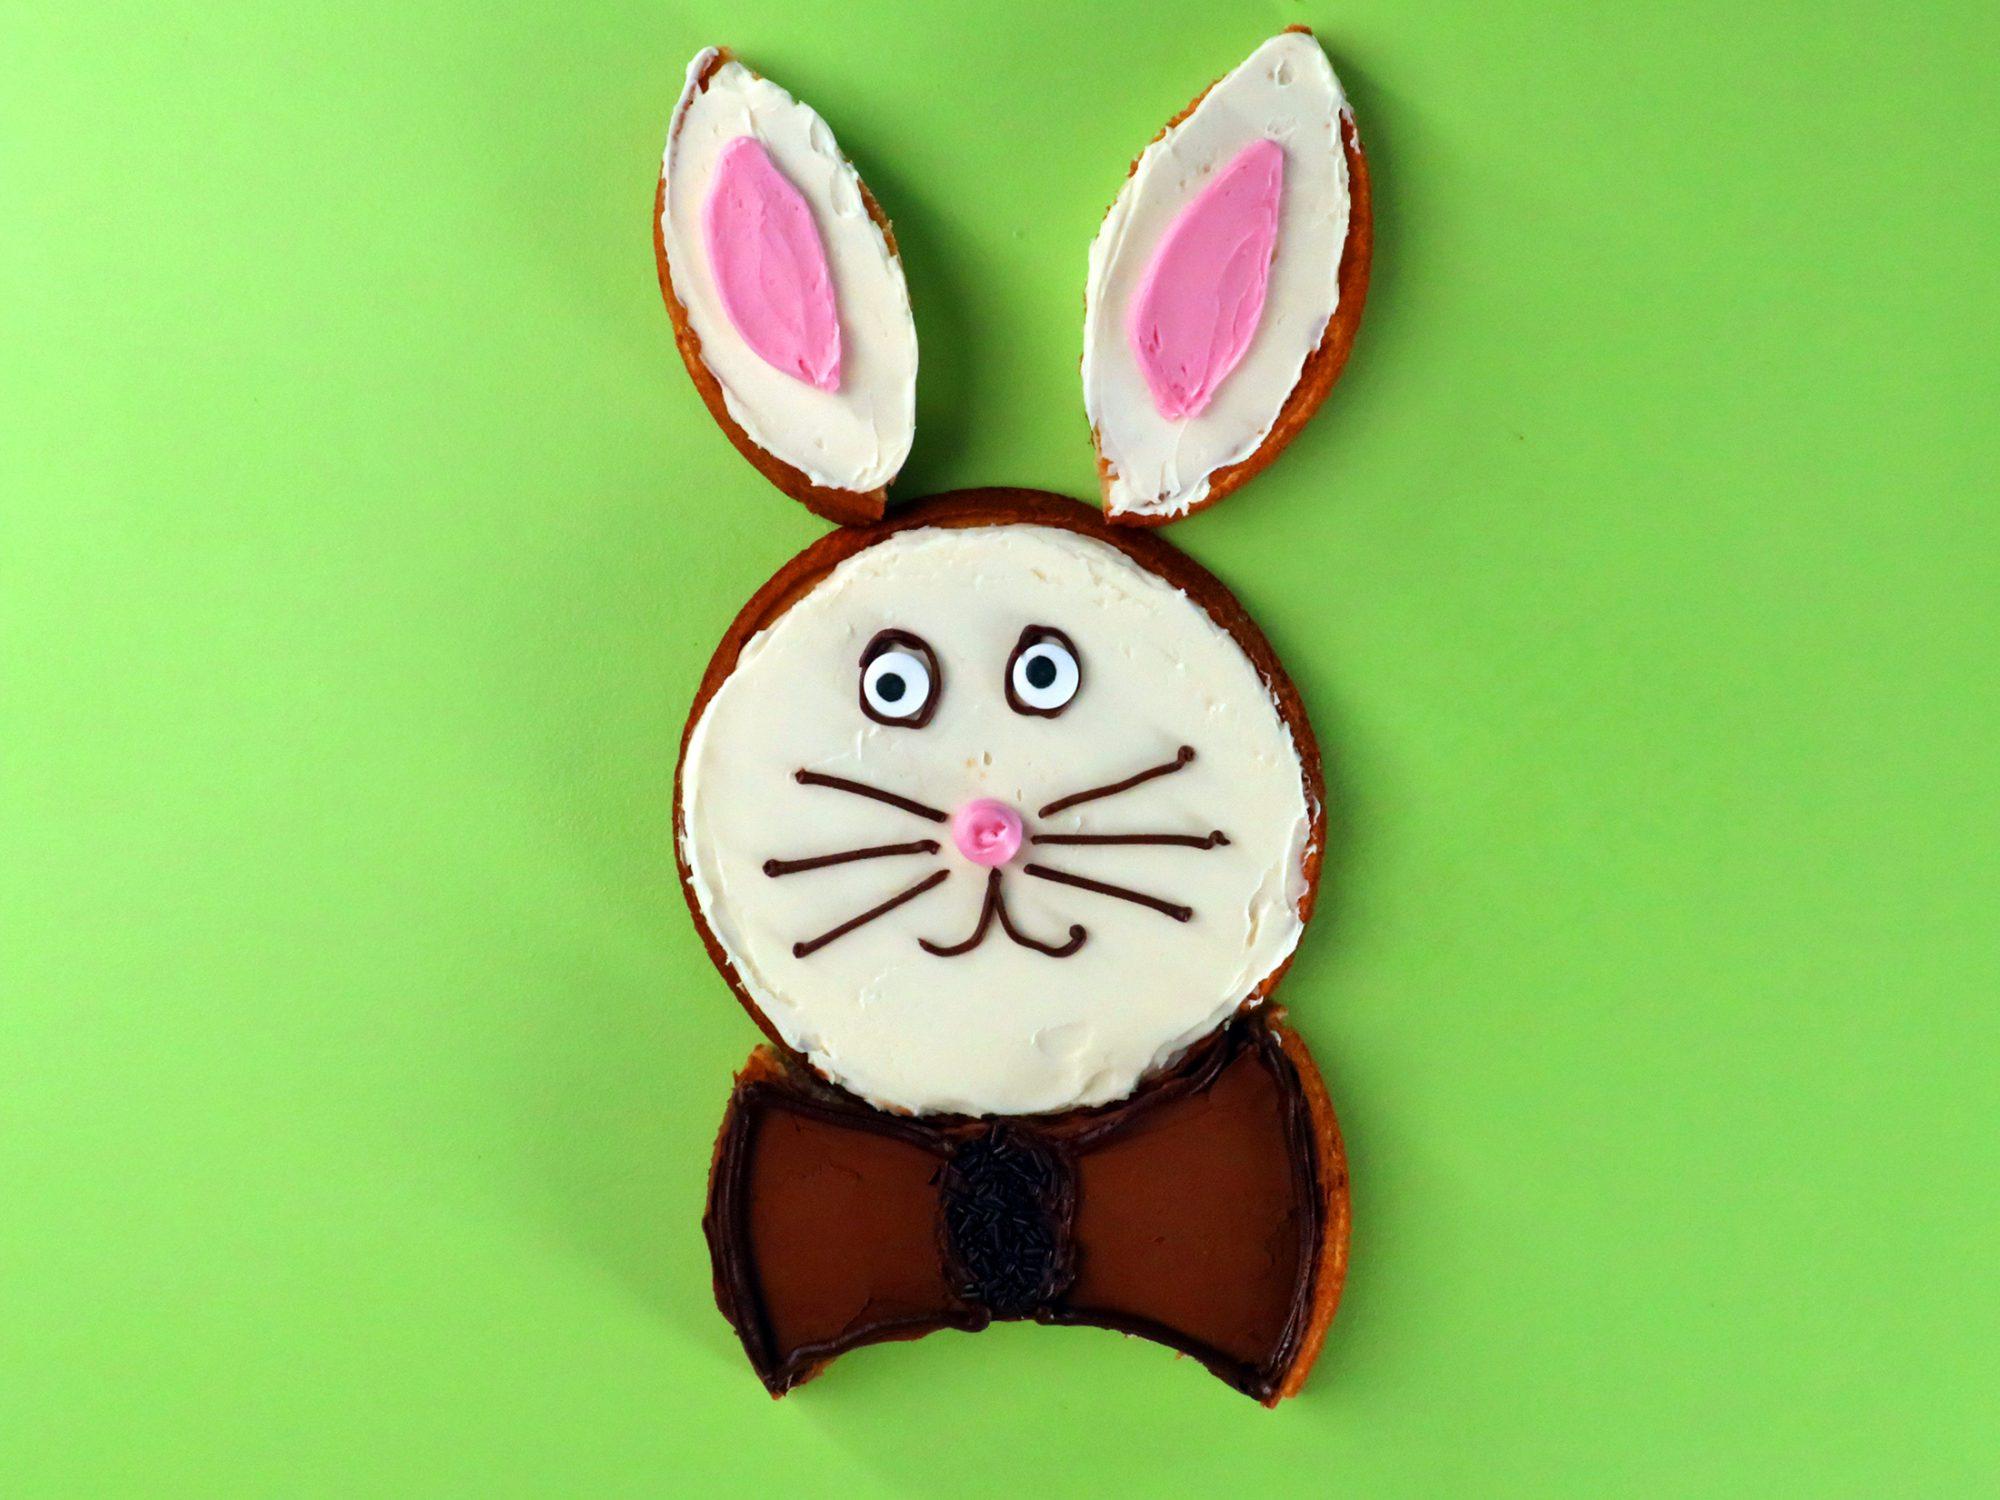 Easter Bunny Cake image